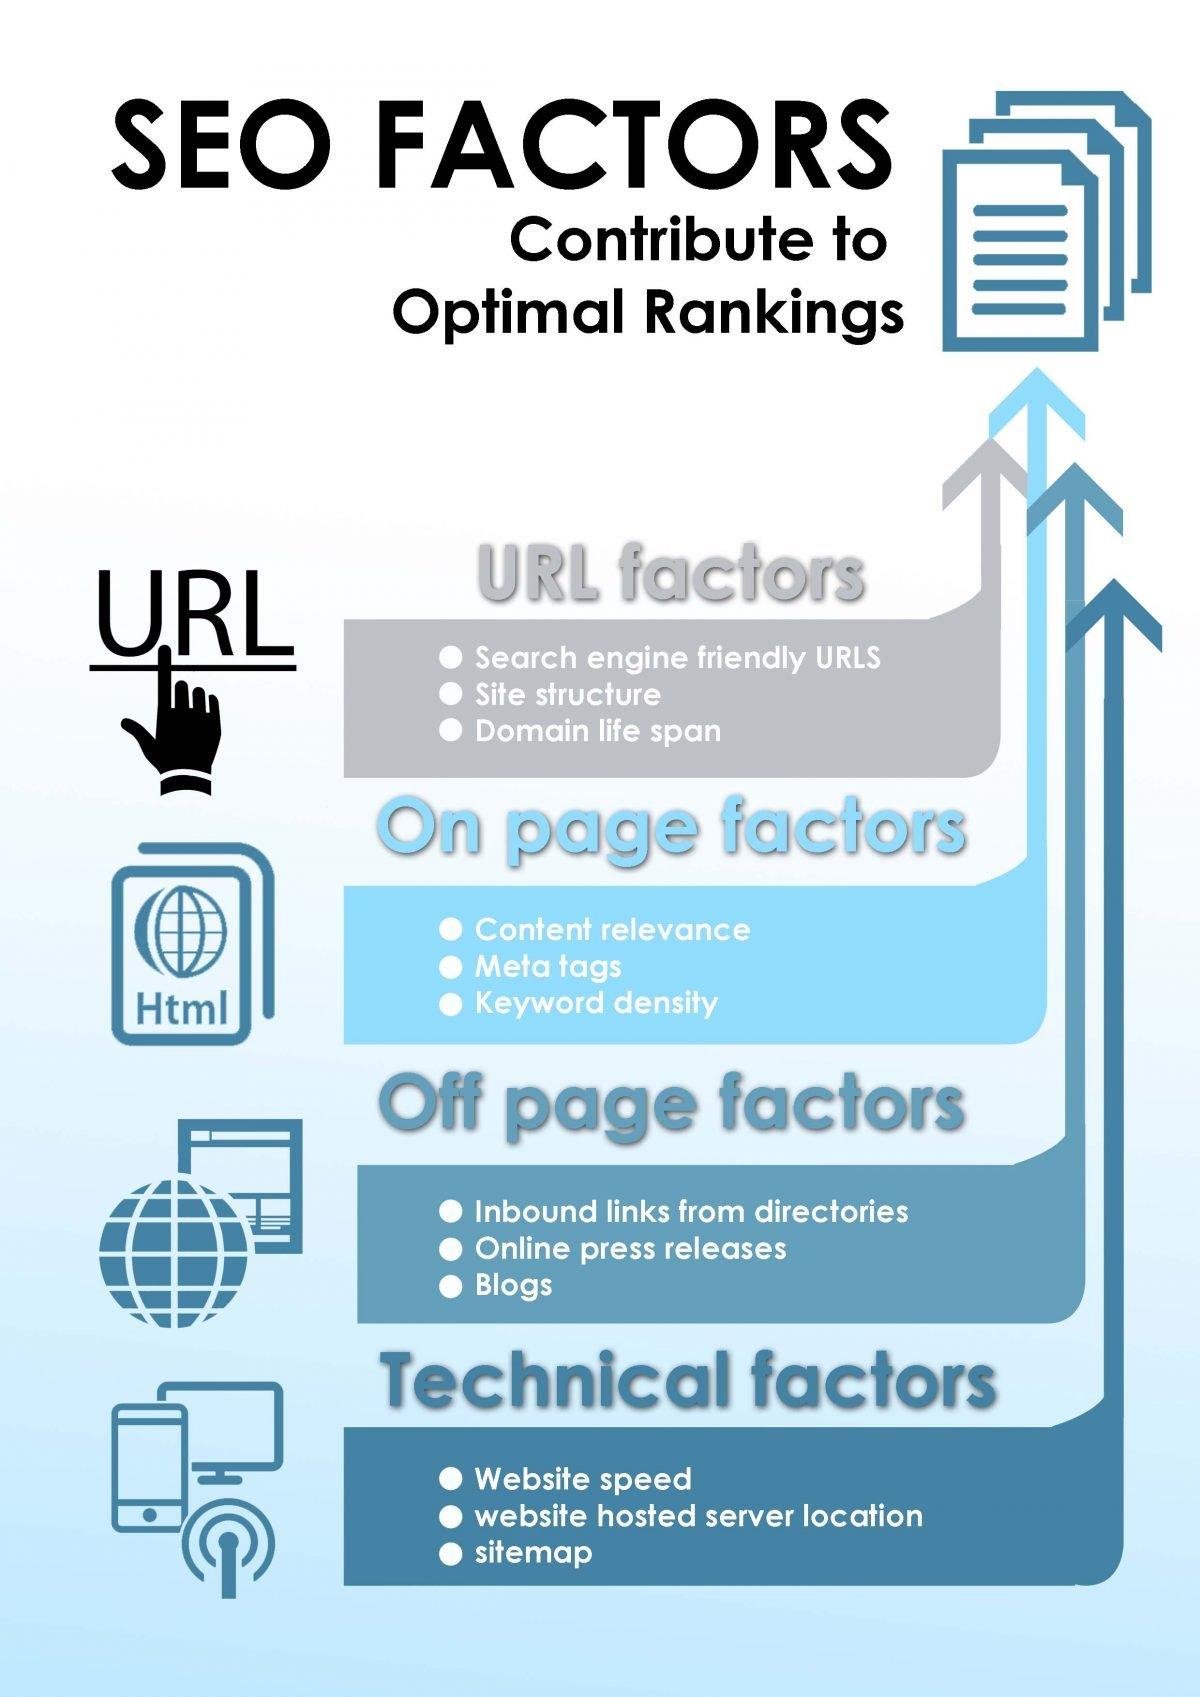 SEO Factors Contribute To Optimal Rankings